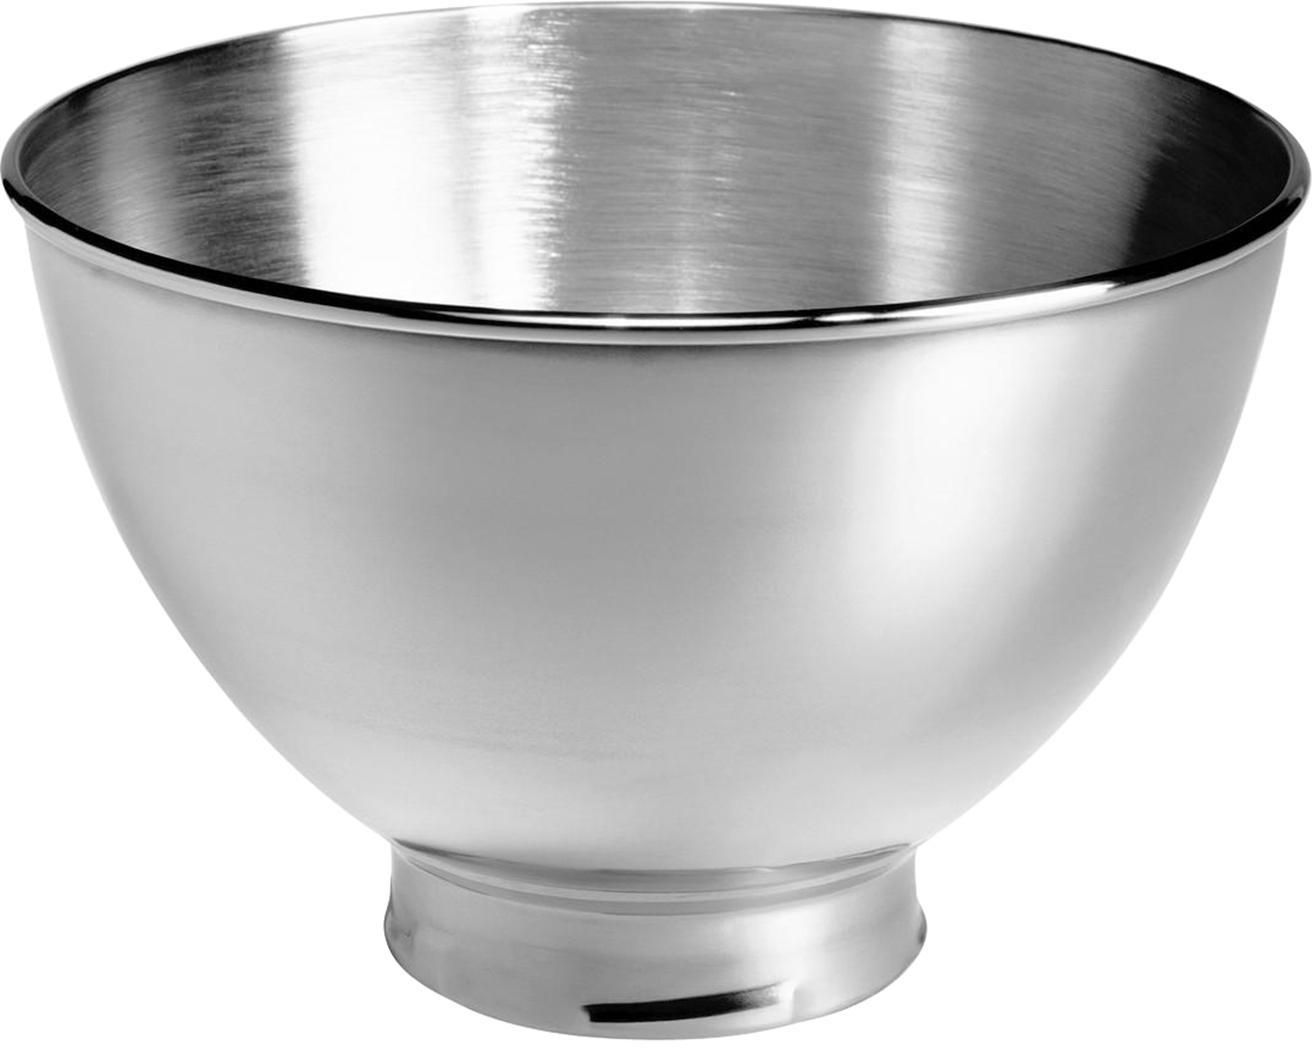 Ciotola in acciaio Inox per planetaria Artisan, Acciaio inossidabile, Acciaio inossidabile, 3 litri